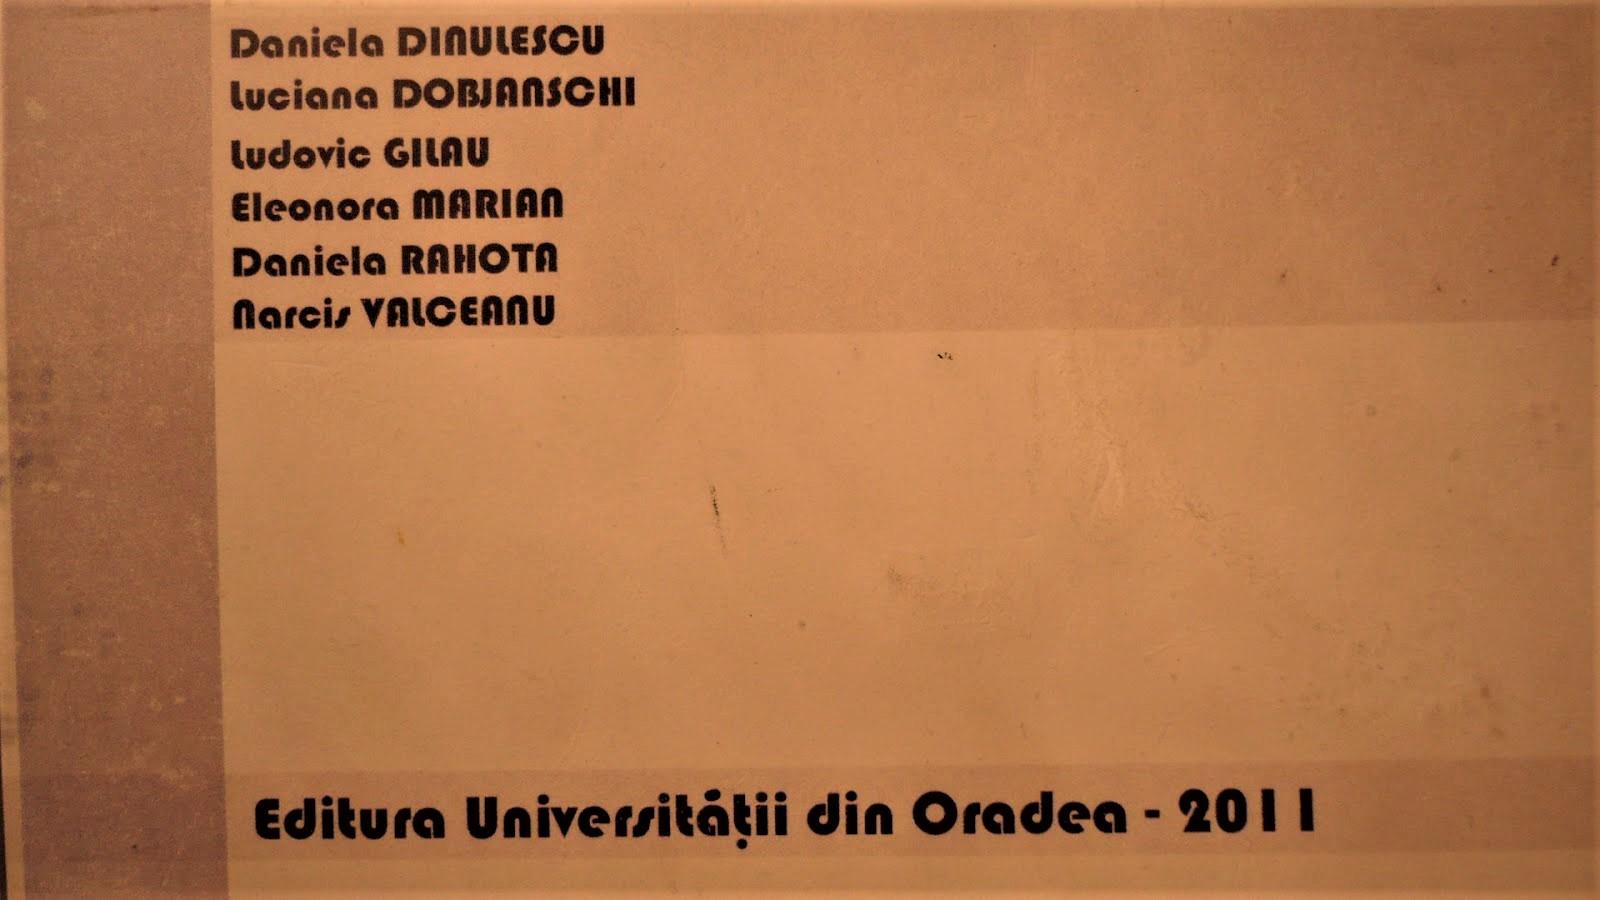 p1550606.JPG